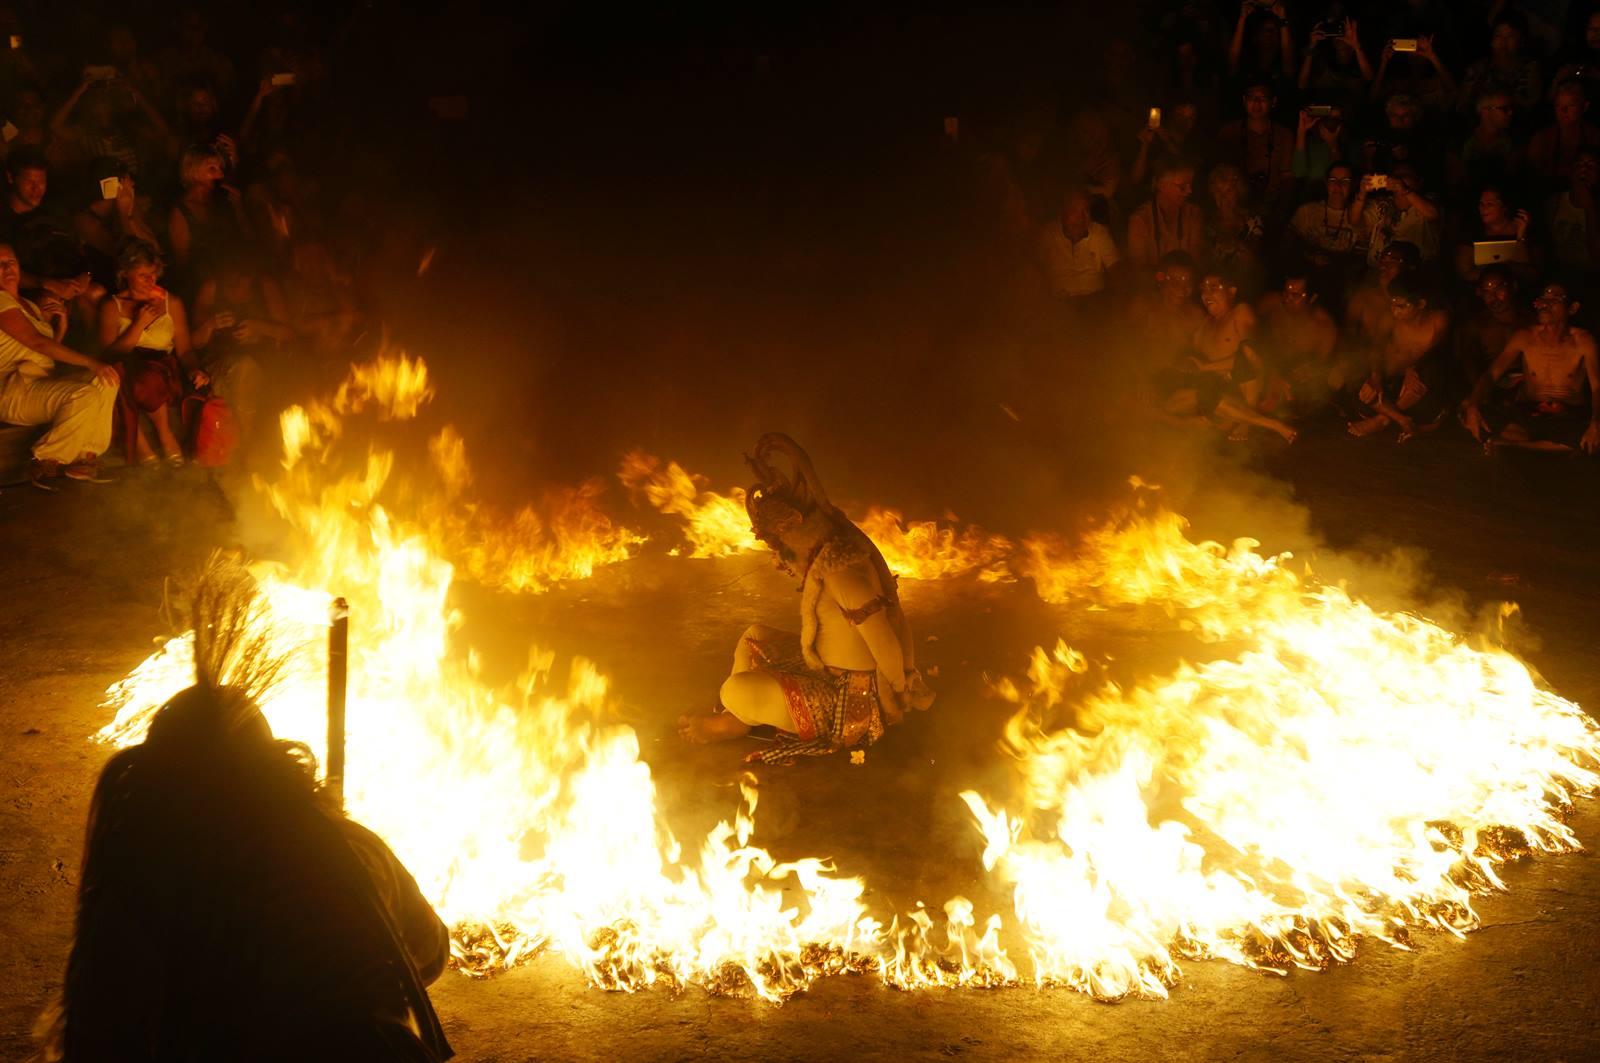 Hanoman yang dibakar, salah satu adegan paling keren di Tari Kecak